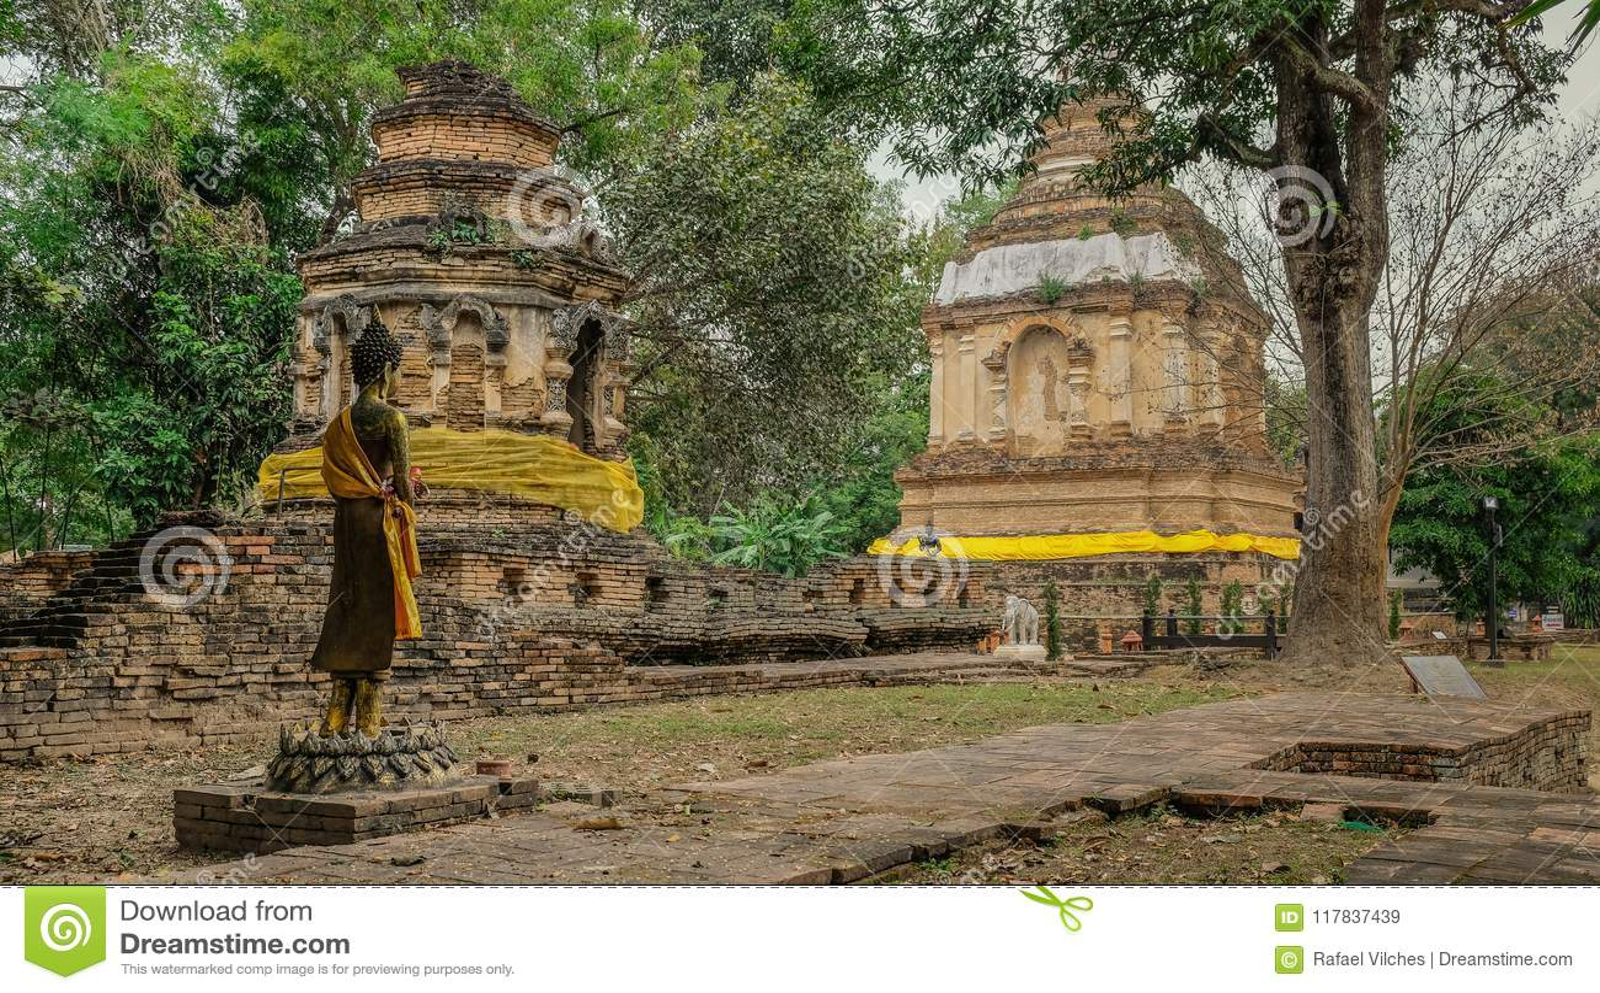 Boeddhistisch betaald in de wildernis